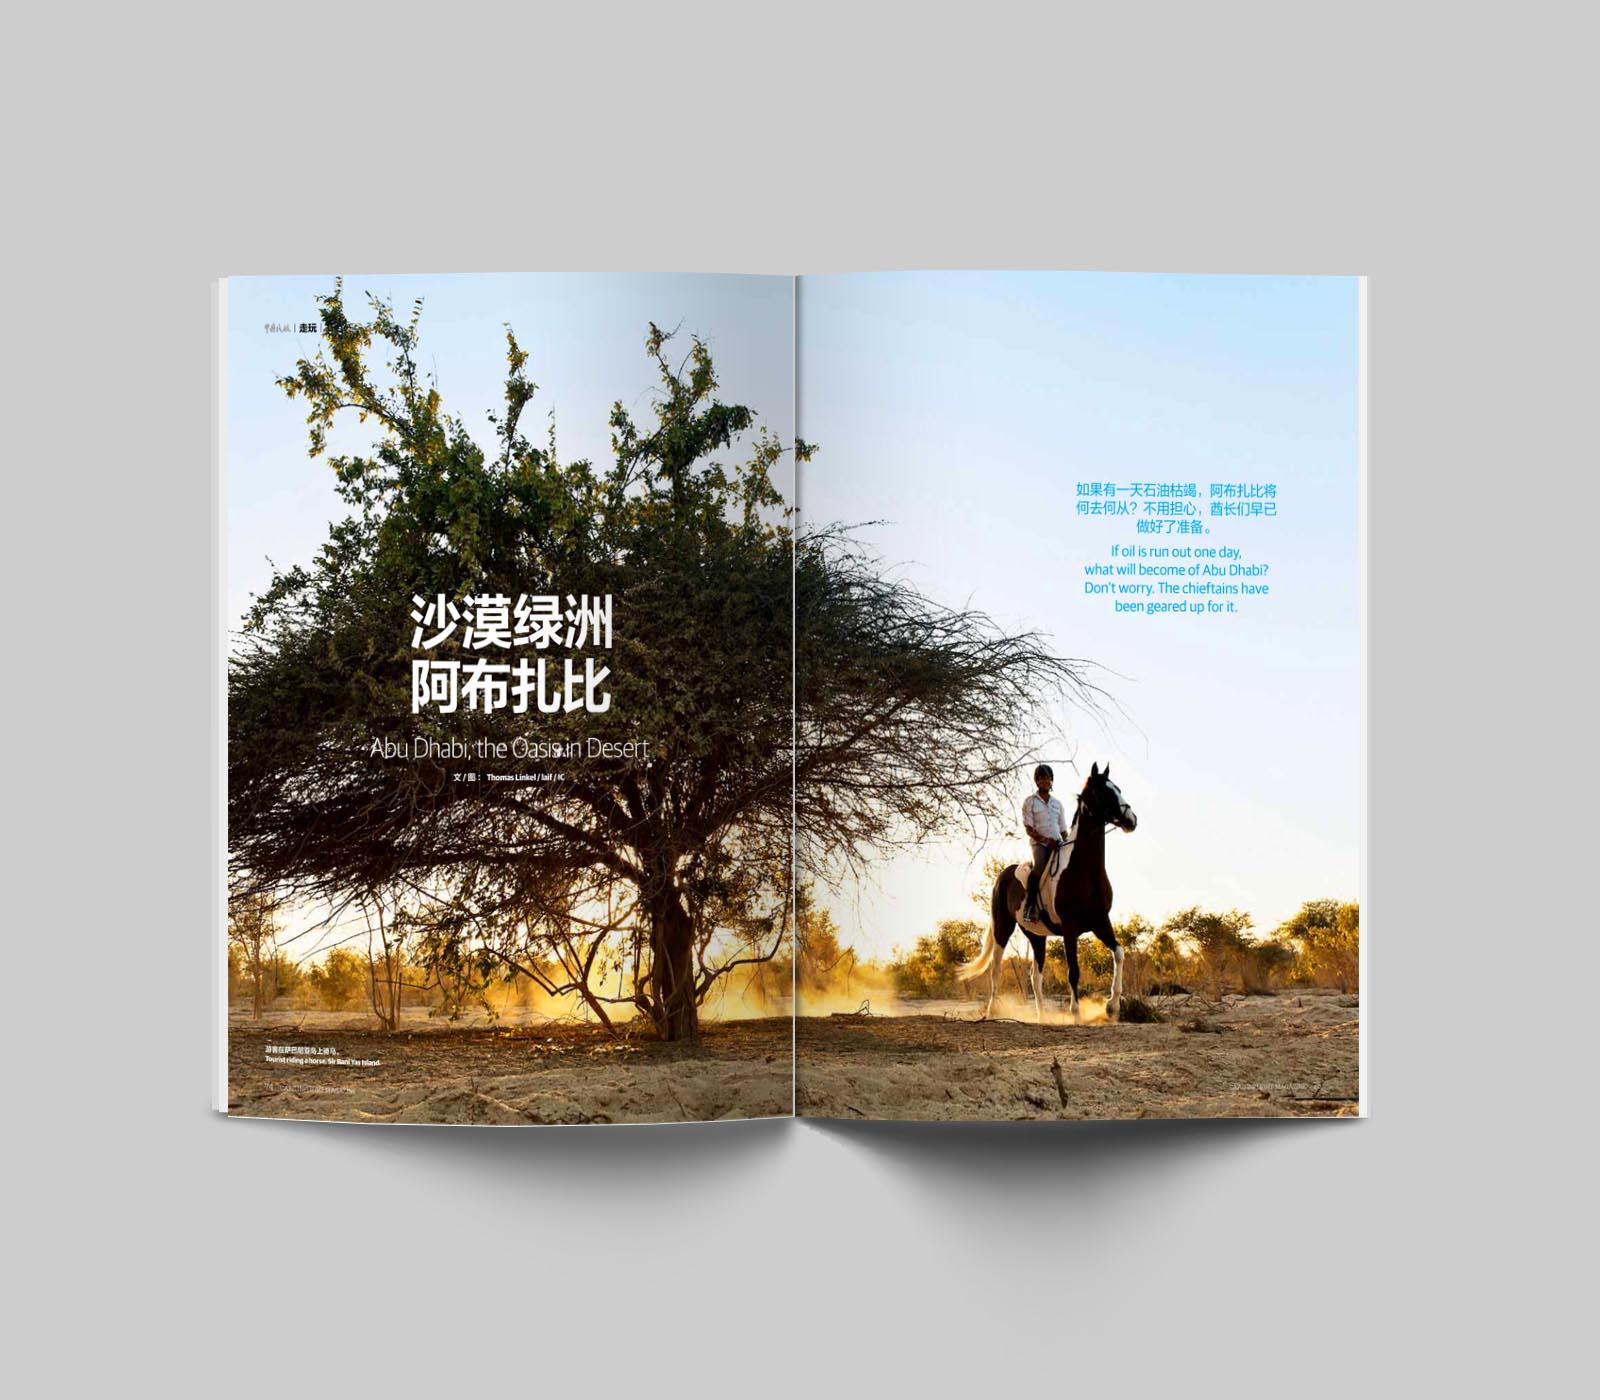 """China Airlines Inflight Magazine"" - Tyrol"